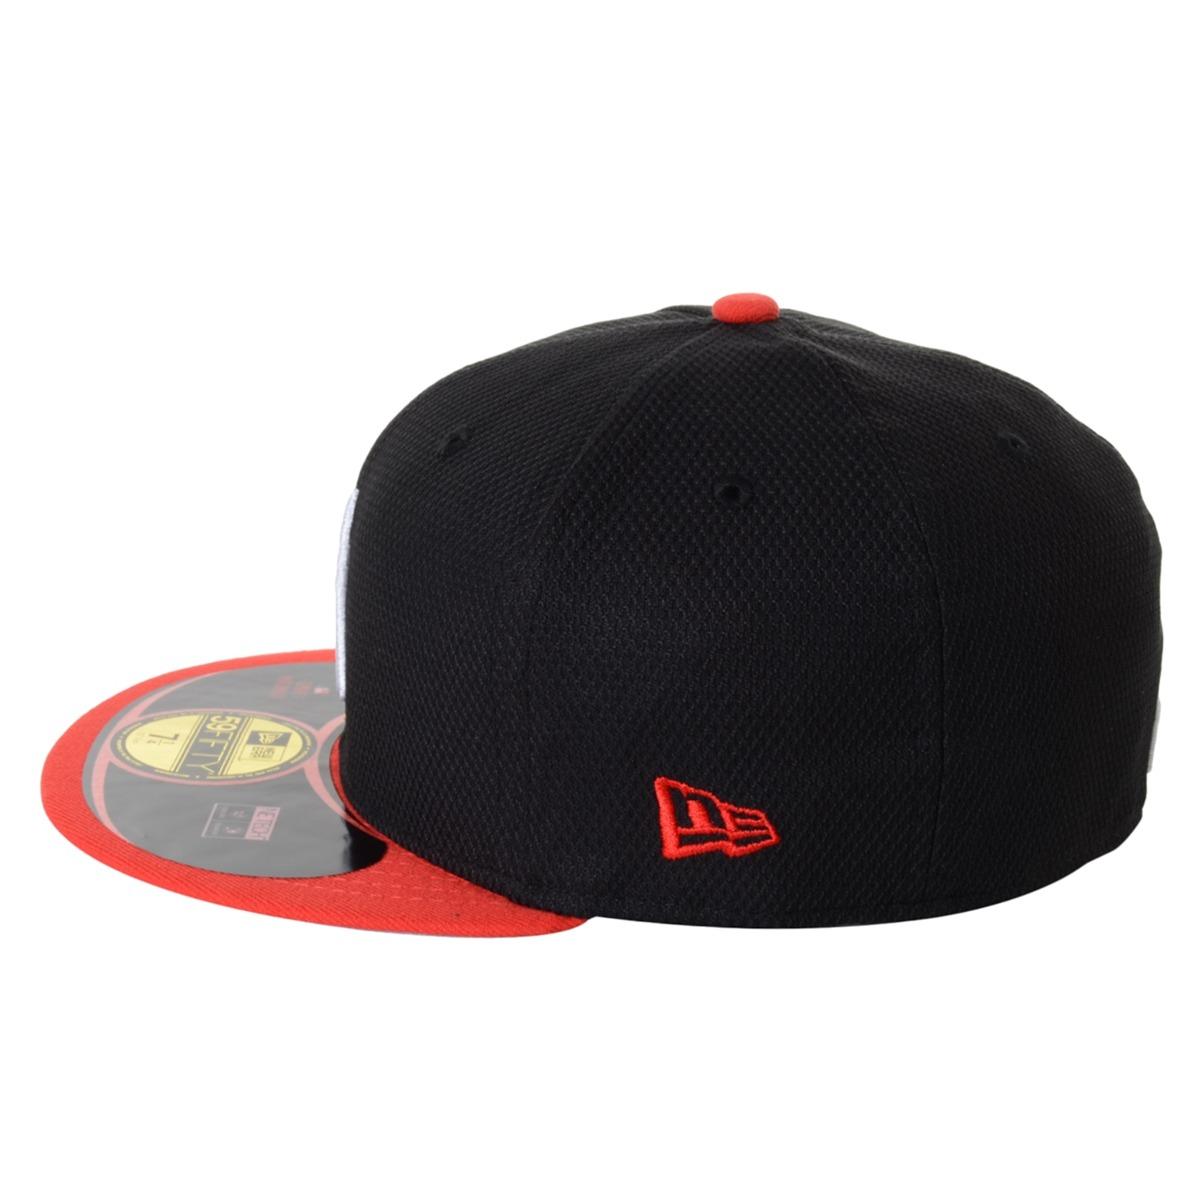 f29a2b57b60 Boné New Era 5950 Diamond Pop New York Yankees - 7 1 8 - R  114